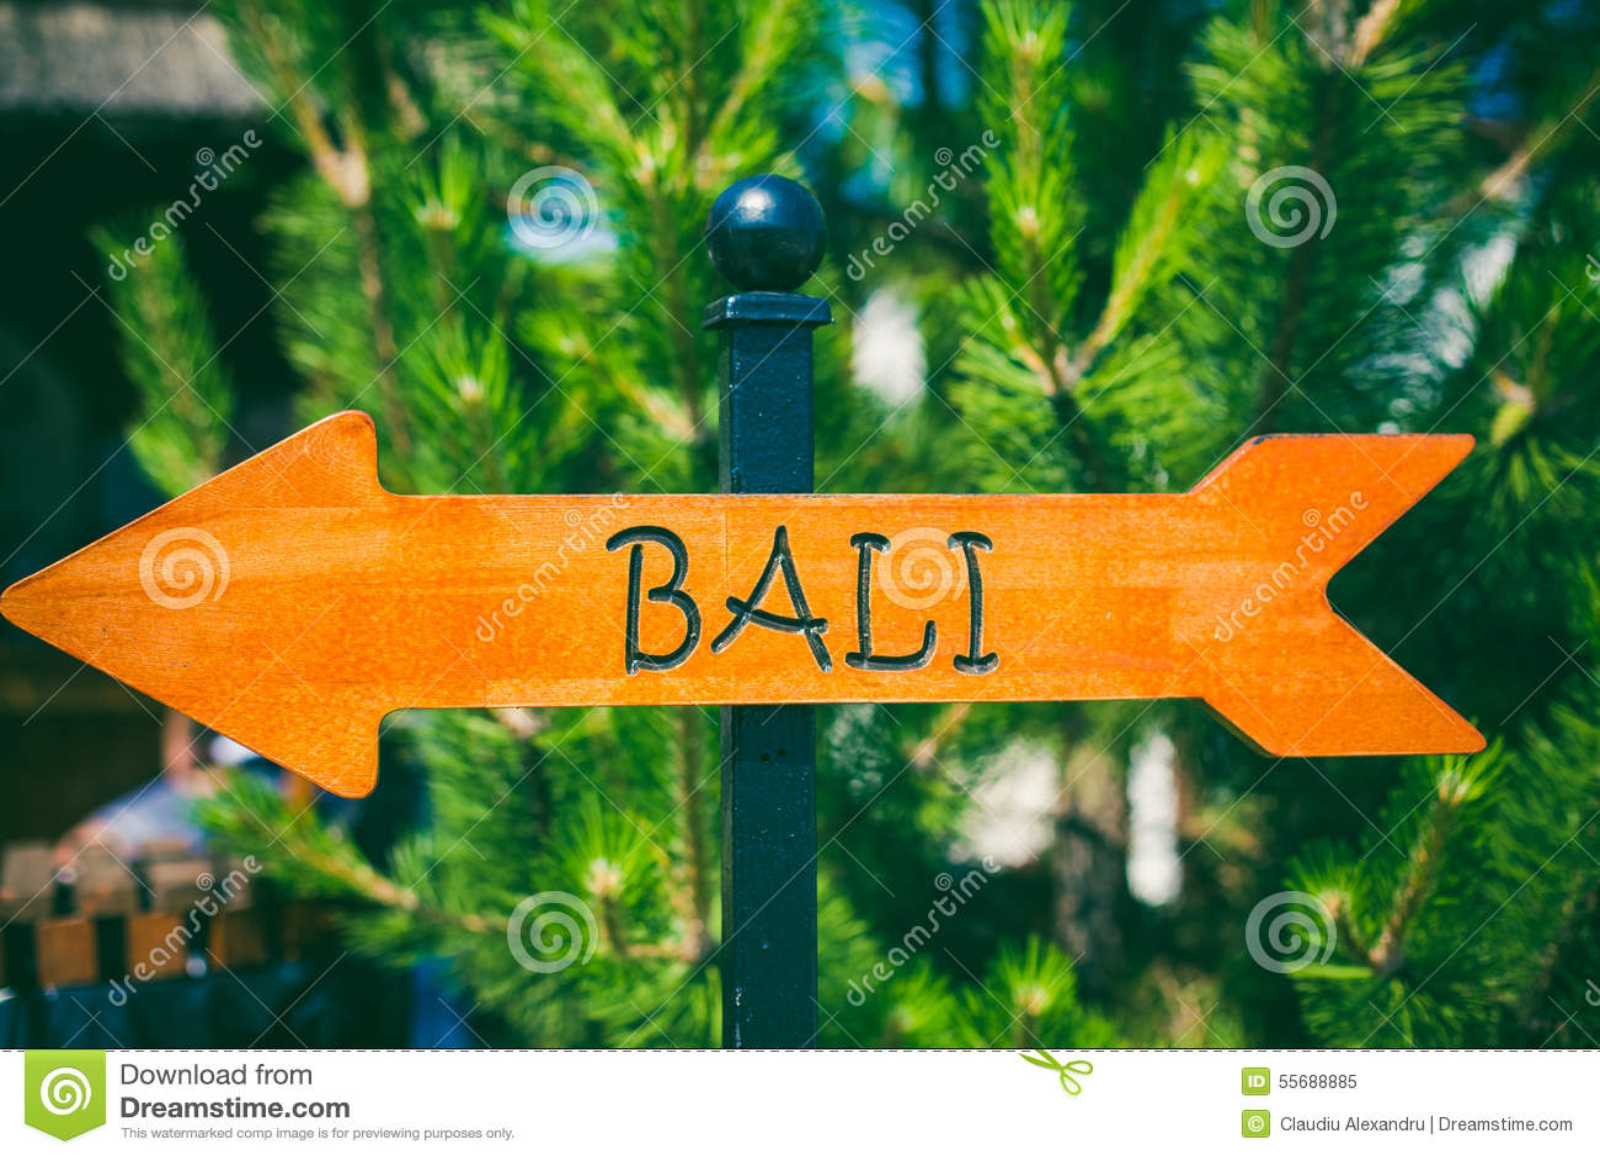 Bali direction sign